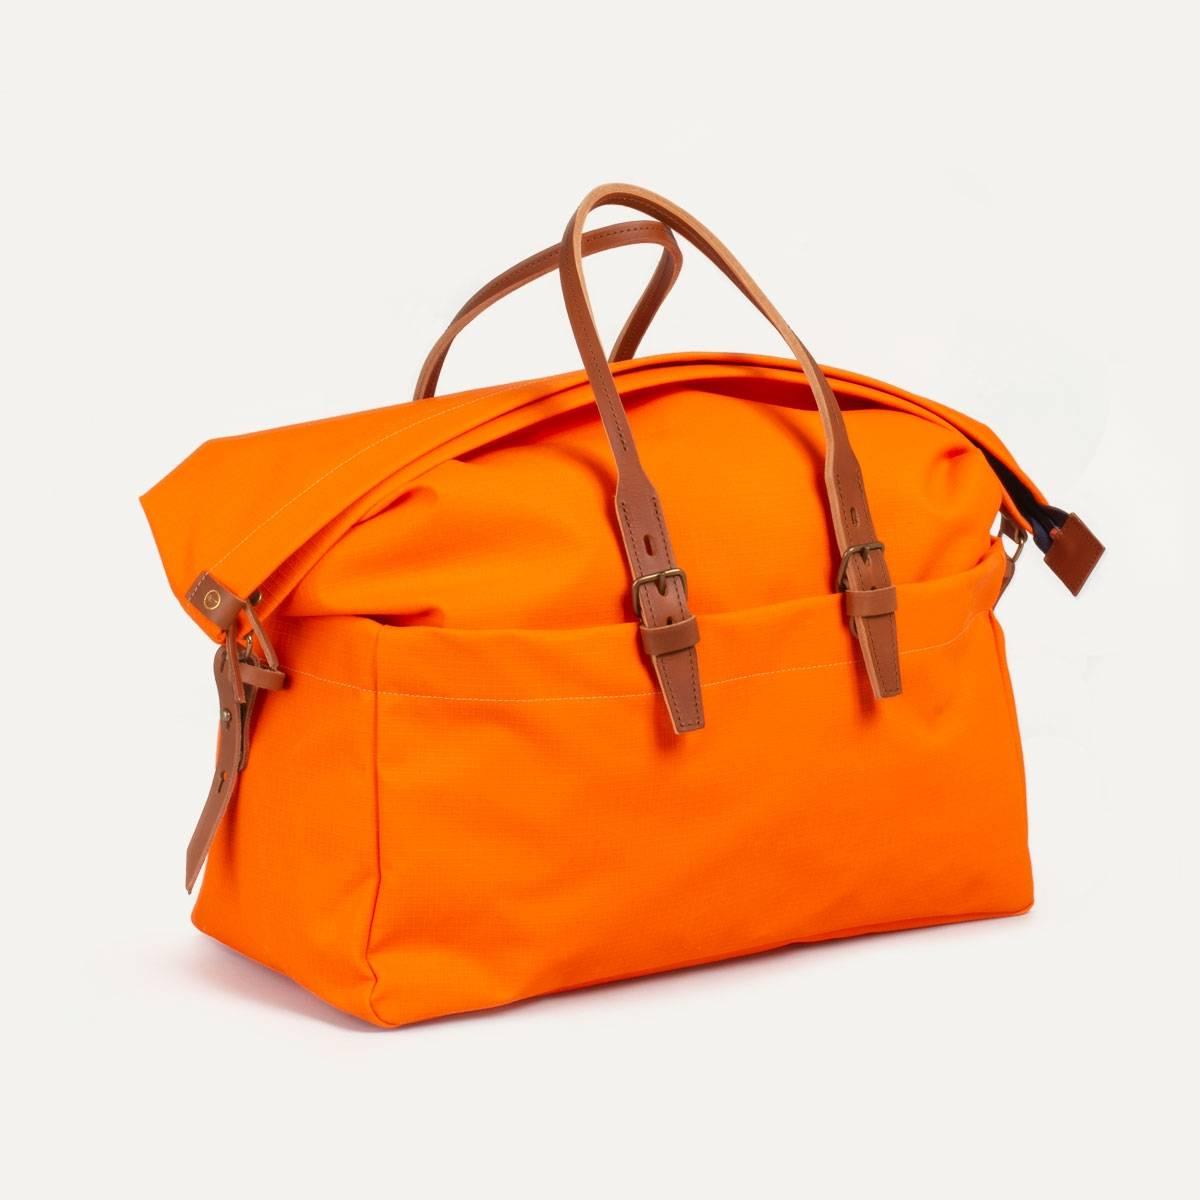 Cabine Travel bag - Regentex orange (image n°2)